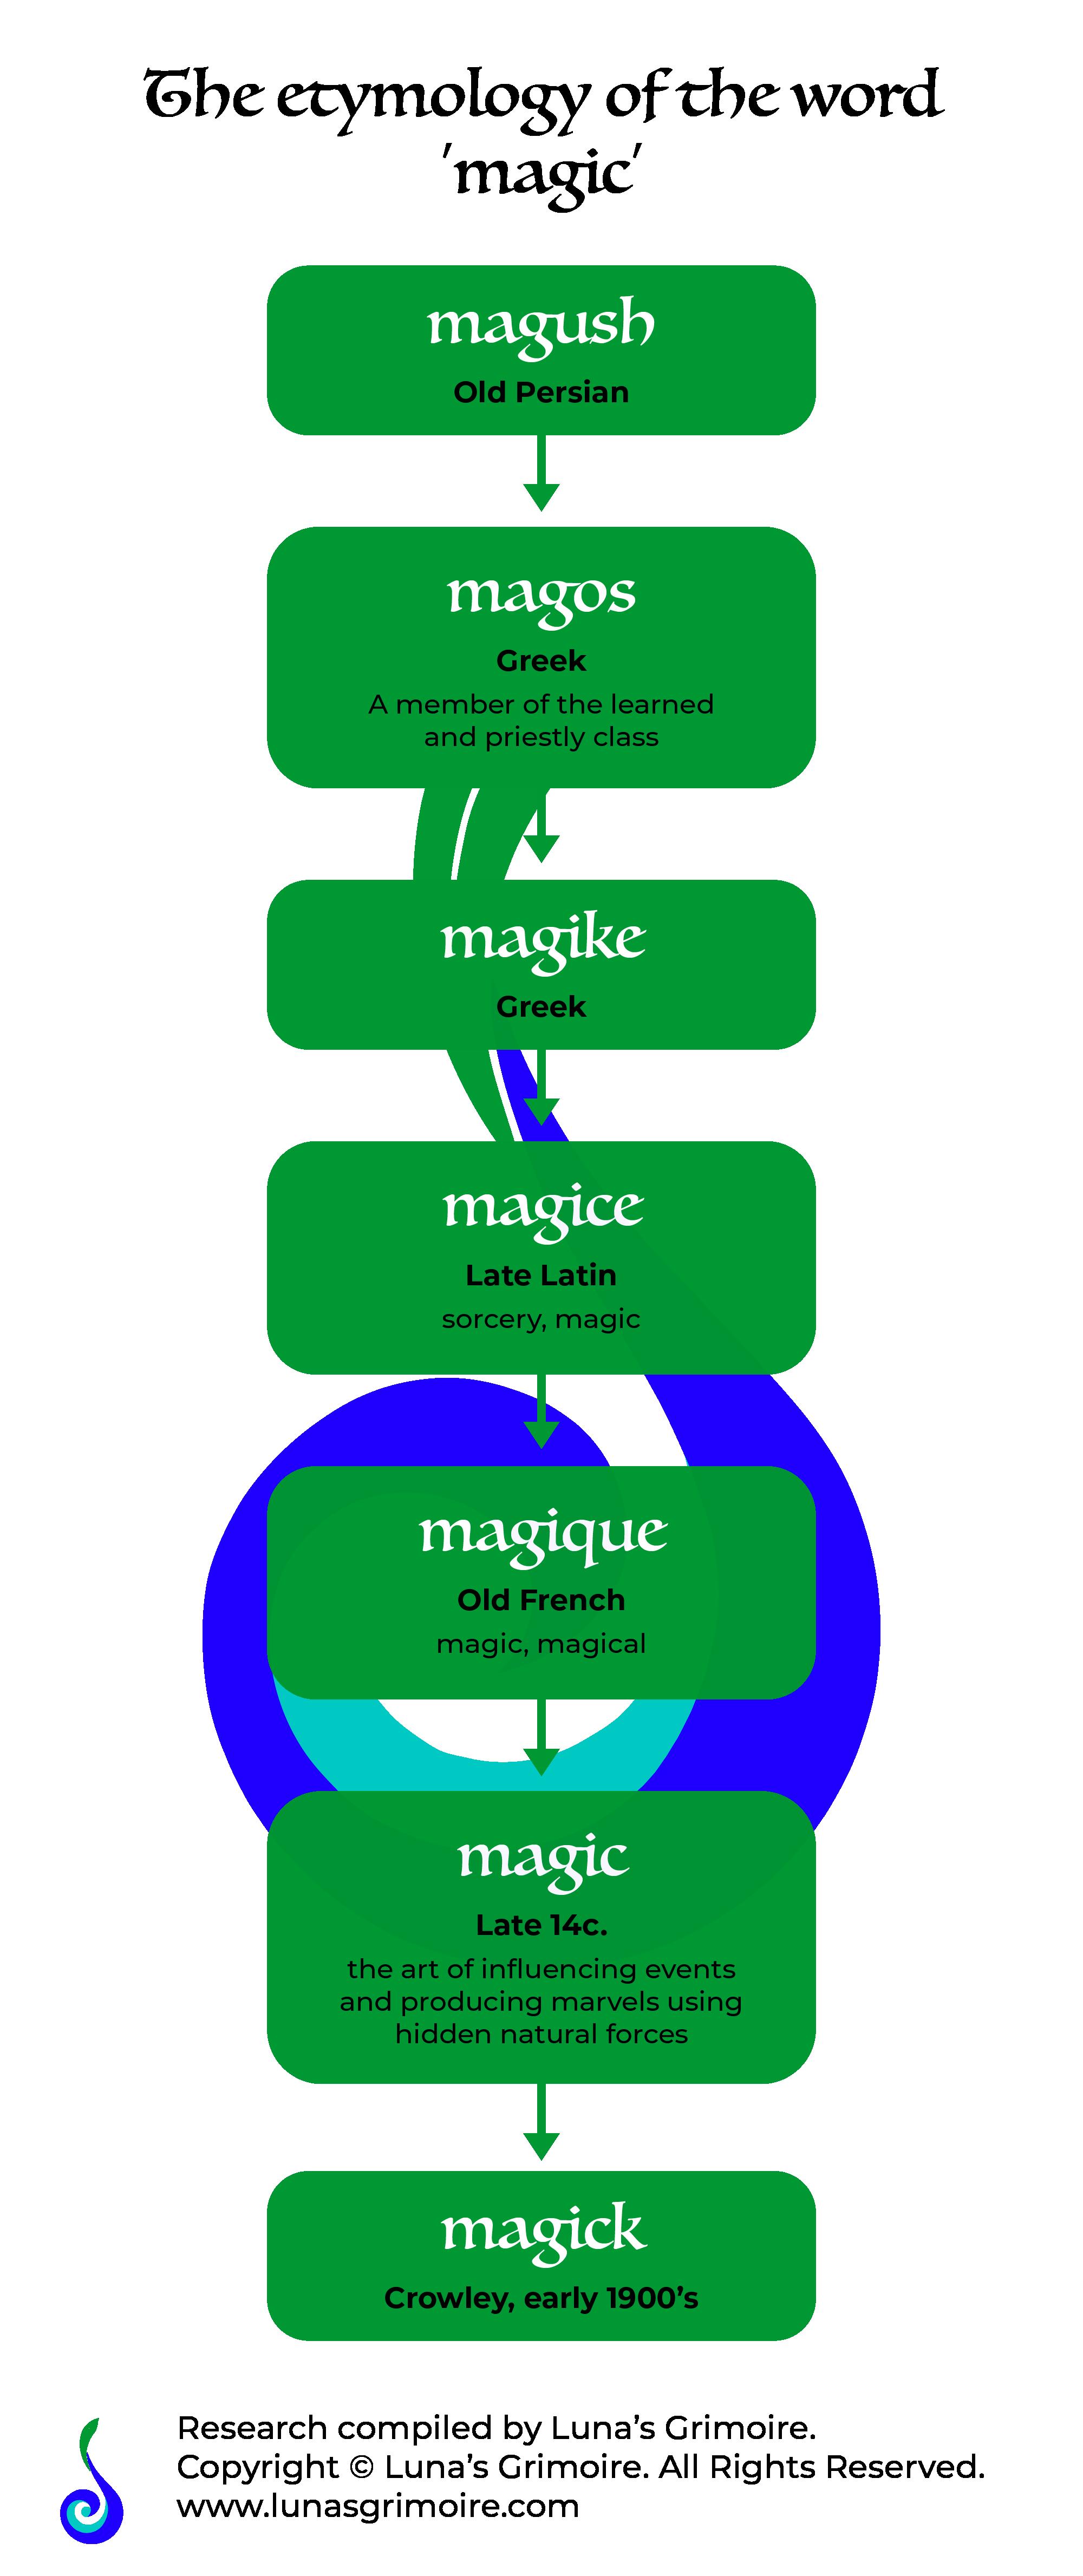 lunasgrimoire magic or magick etymology map